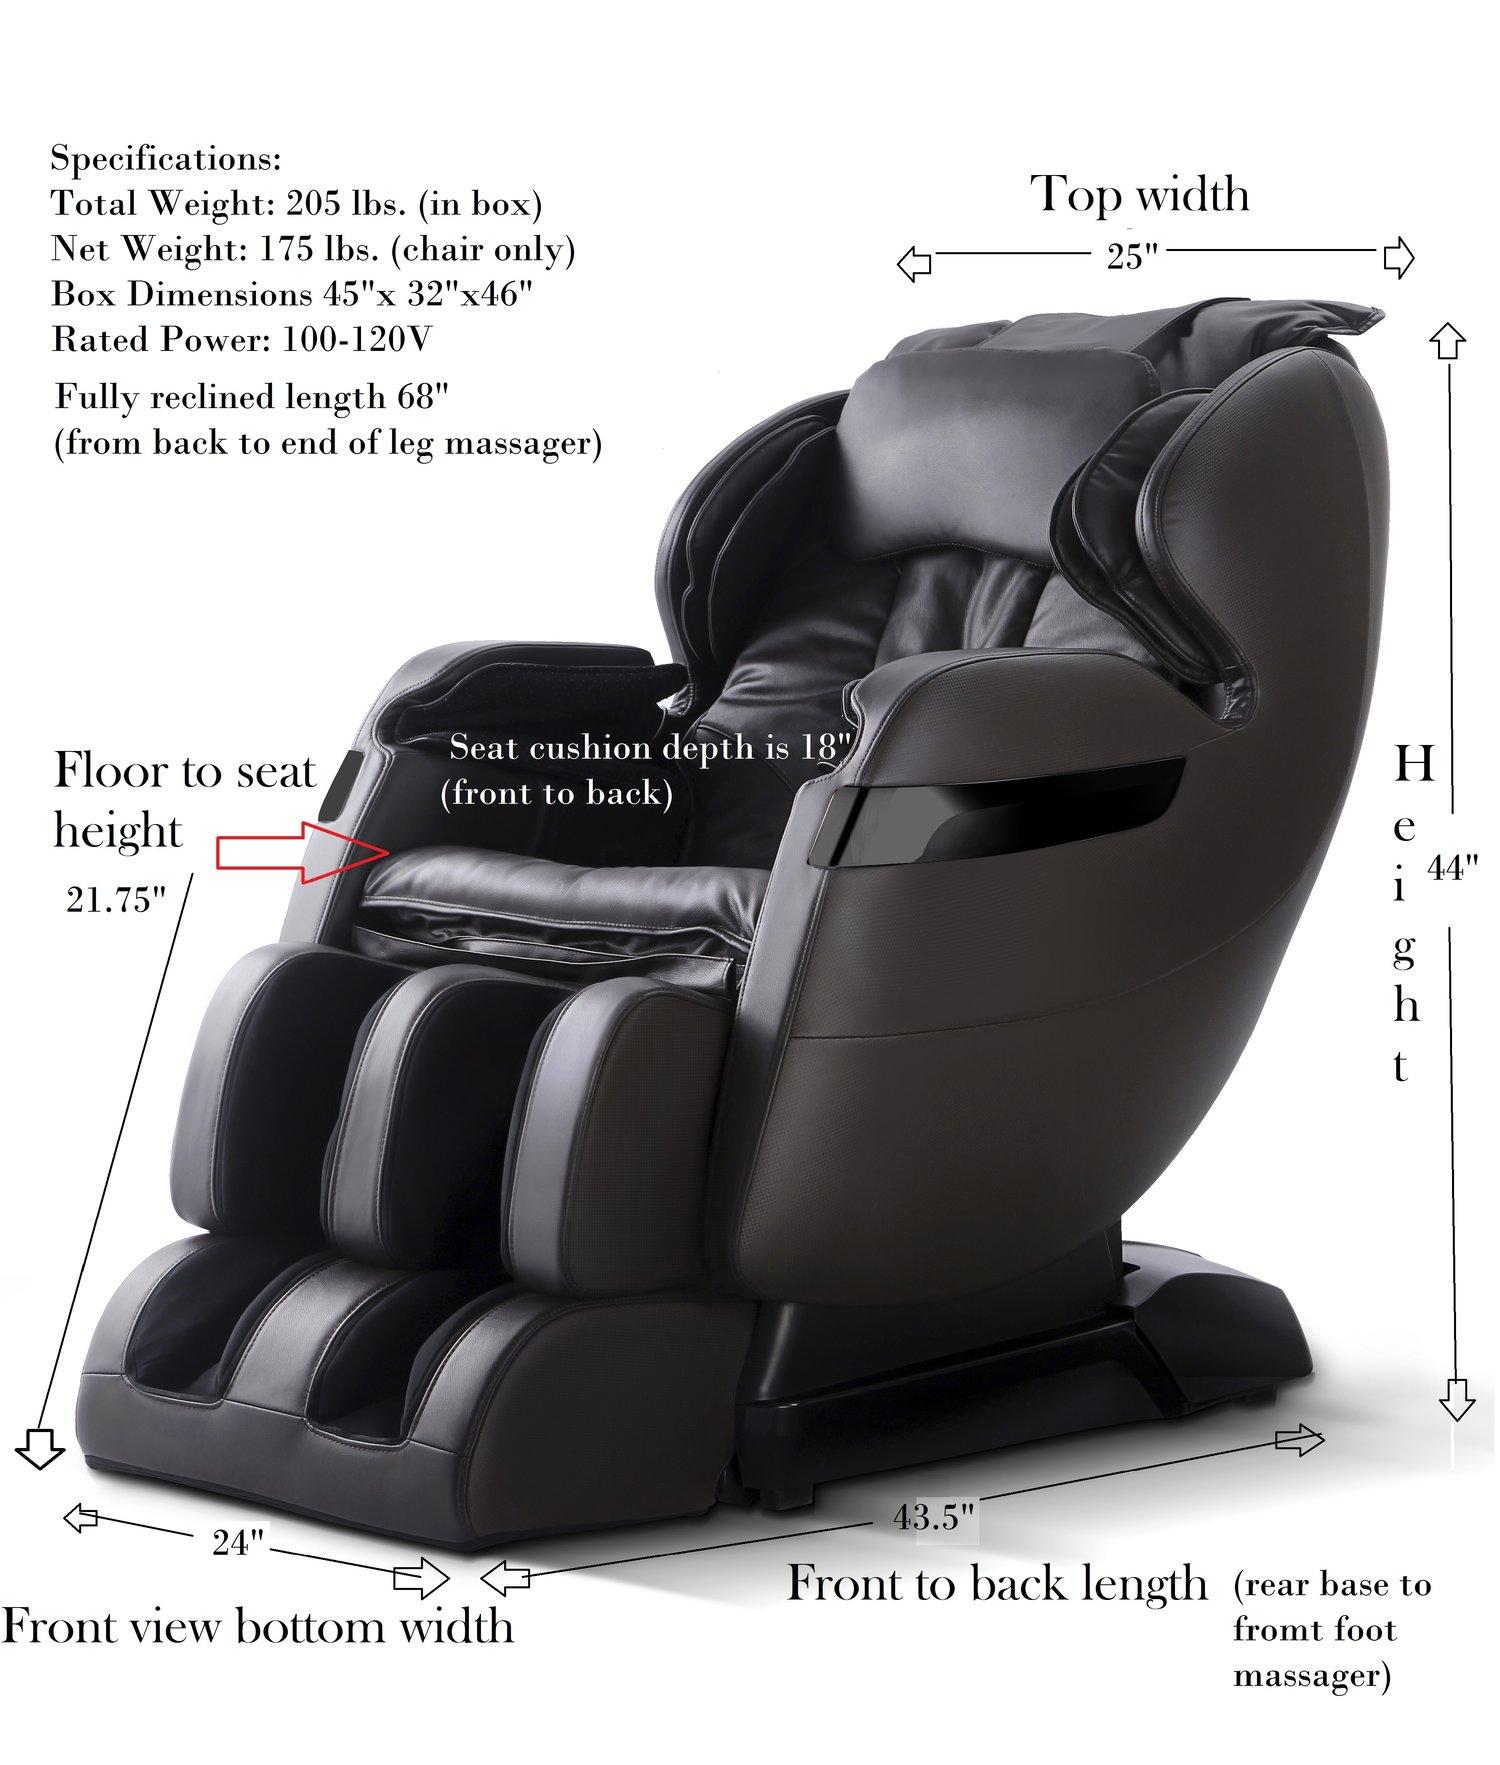 massage chair with leg massager. fr-5ks premier back saver massage chair with leg massager